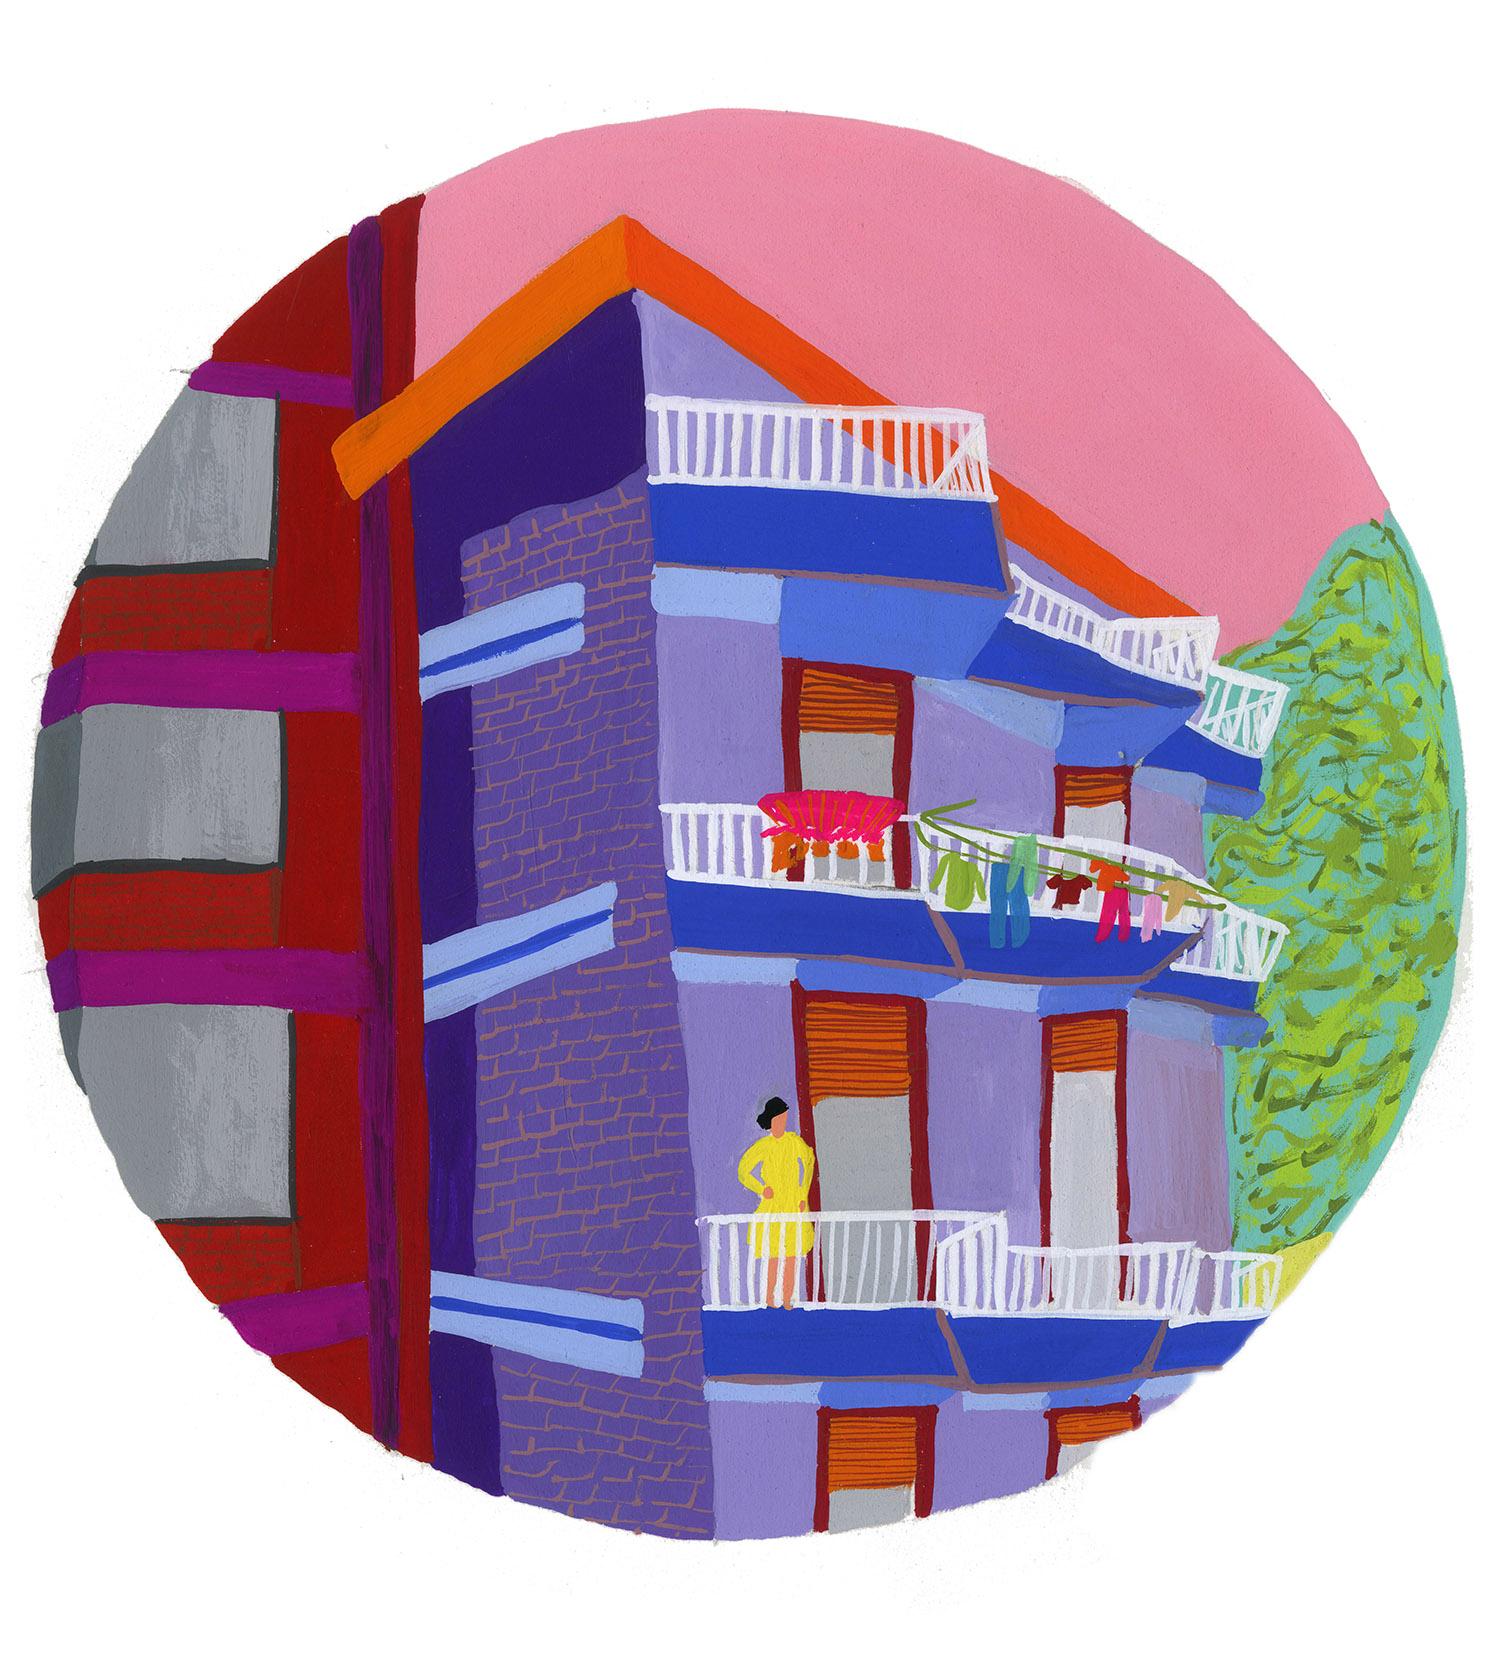 Lady Balcony Apartment Illustration .jpg